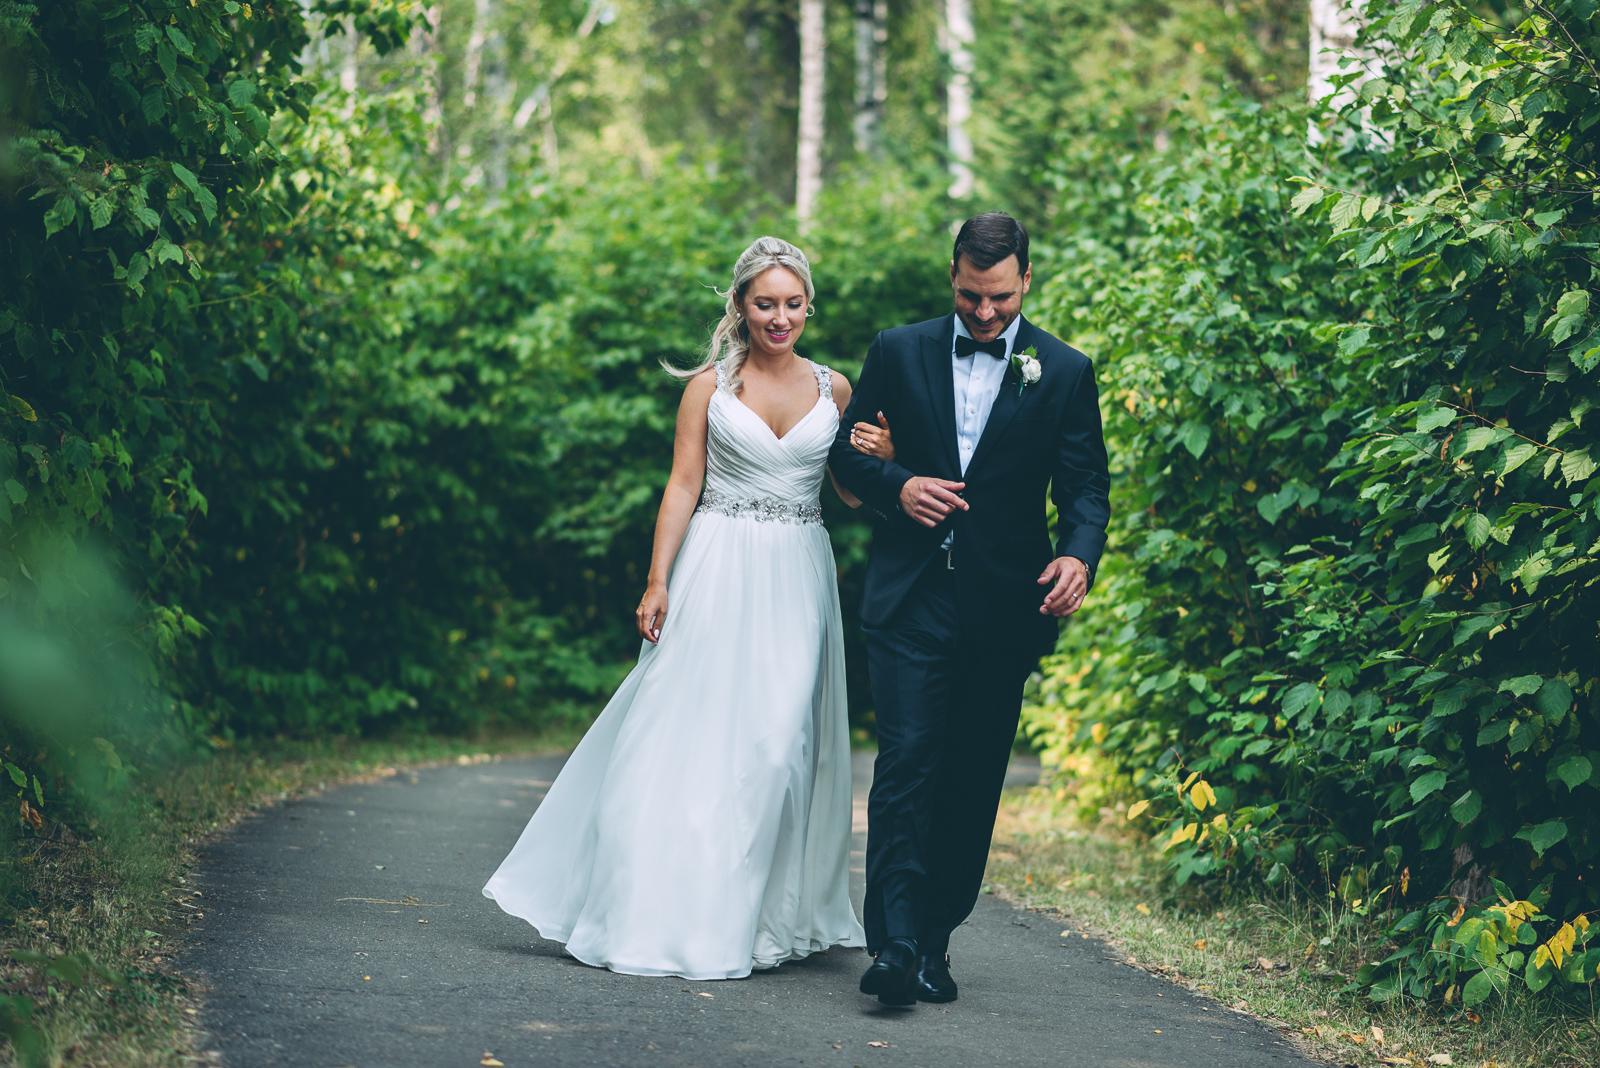 emily-jared-wedding-blog-74.jpg